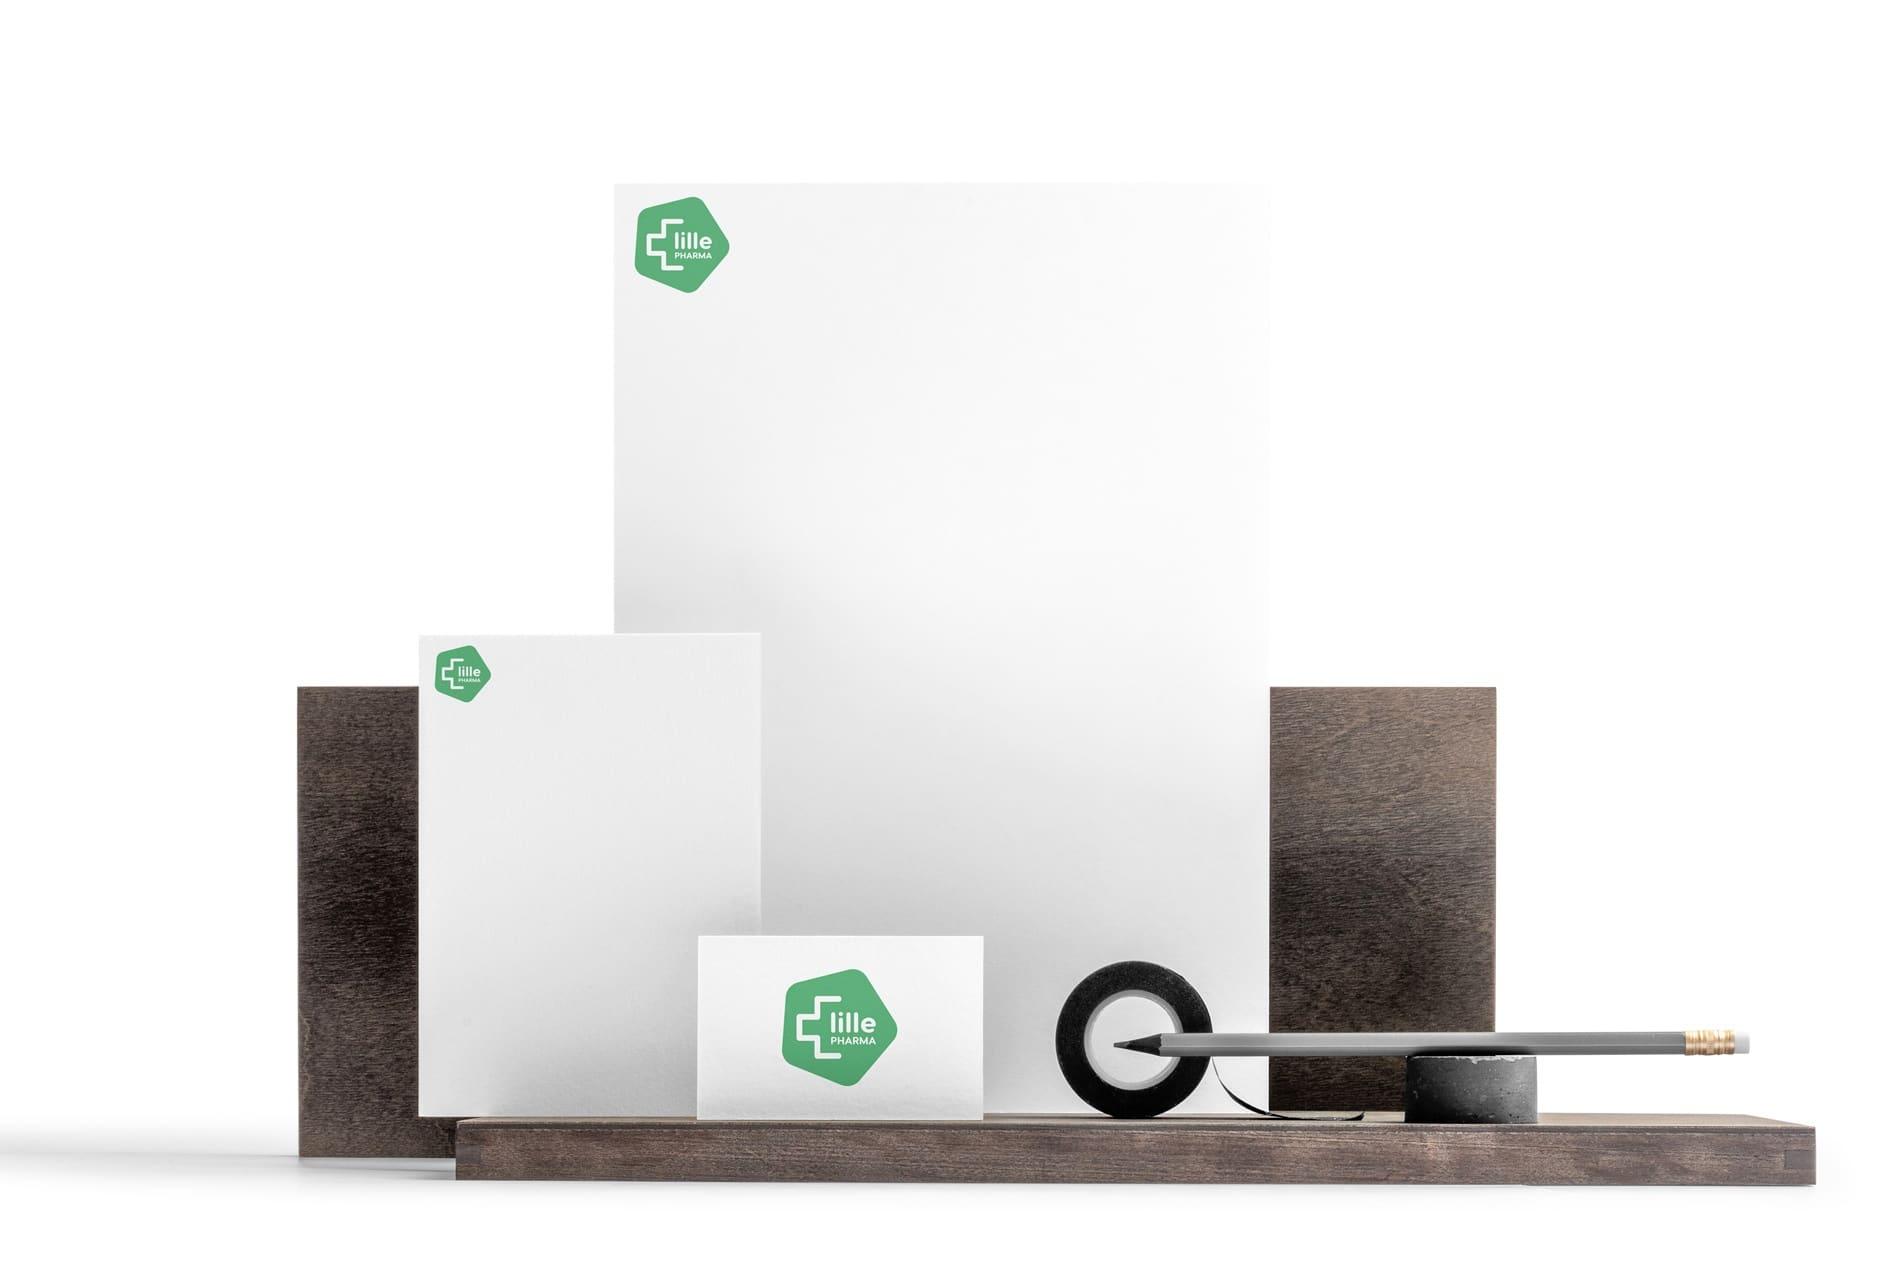 Création logo lille pharmacie des halles